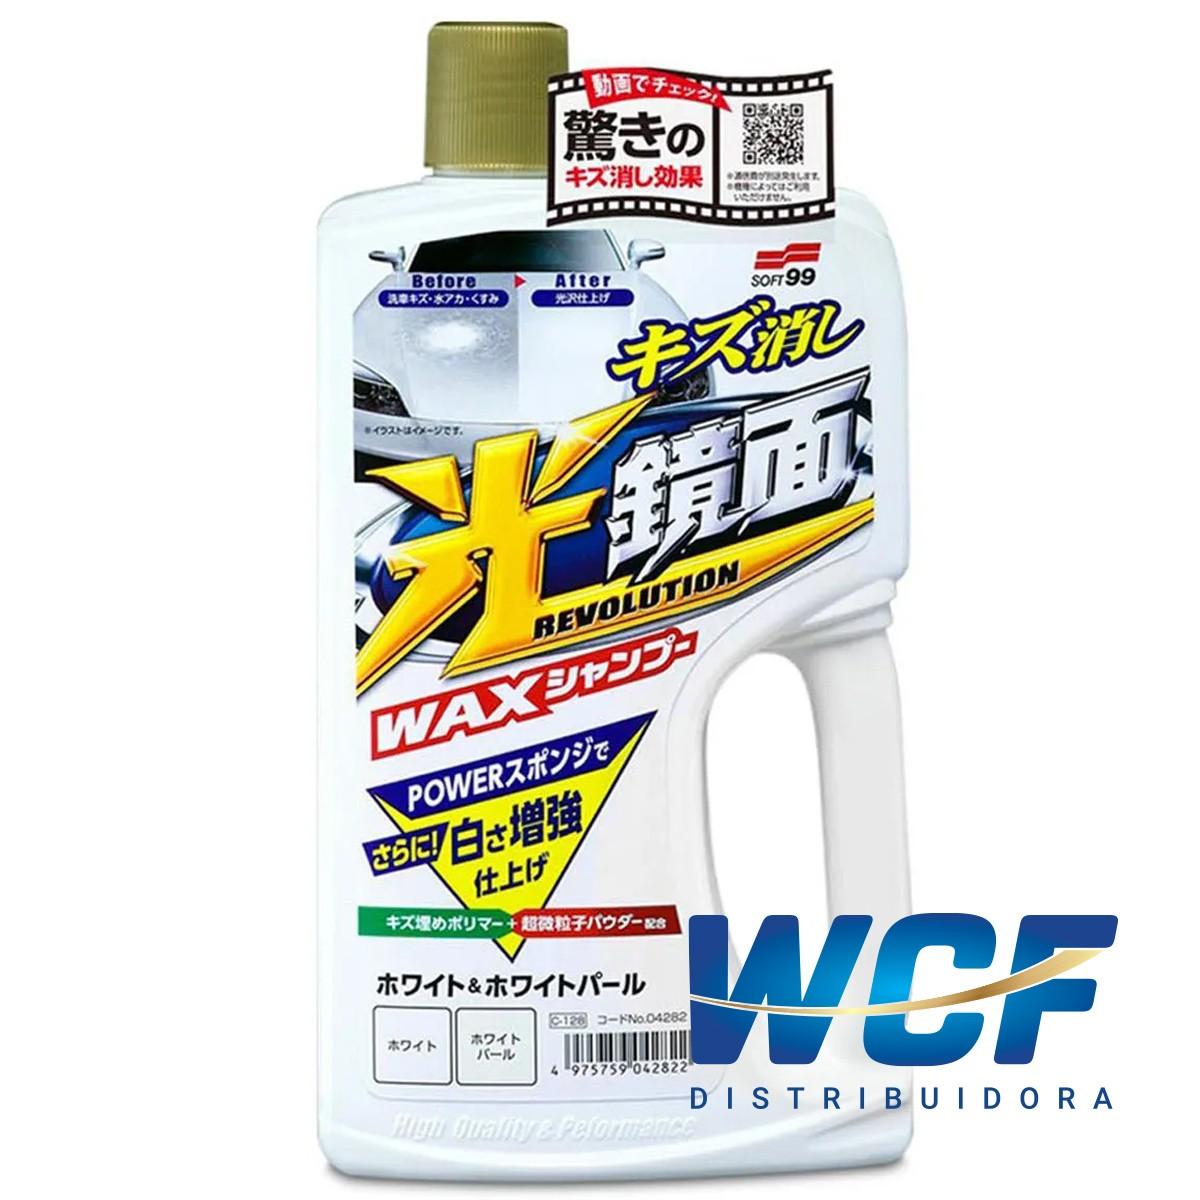 SOFT99 SHAMPOO  WHITE NEW SCRATCH CLEANER MIRROR 700 M L